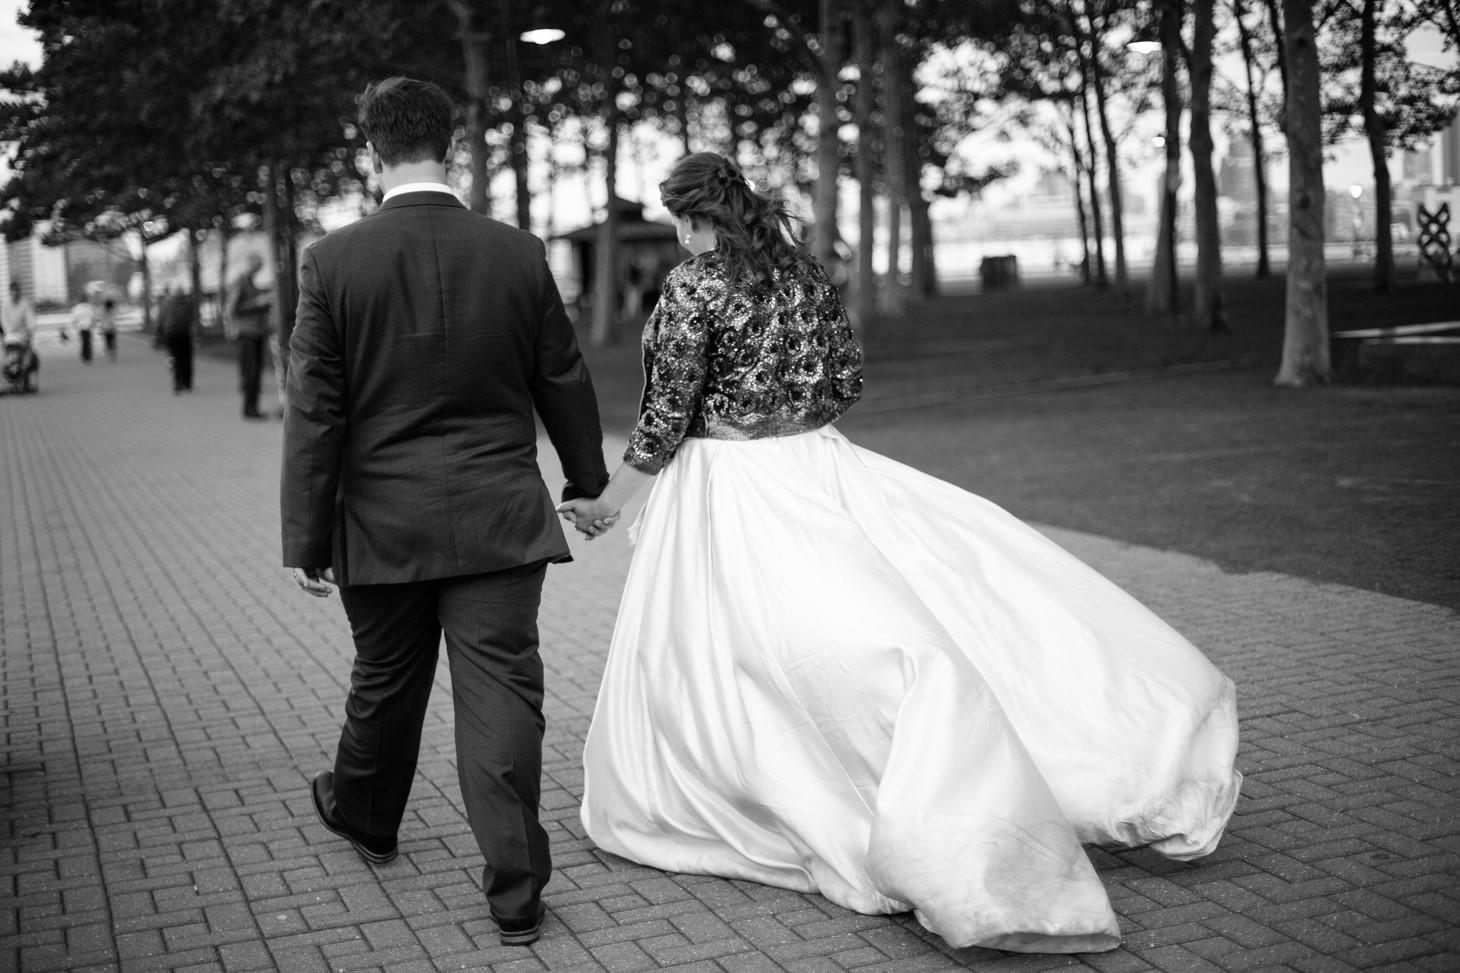 032-nyc-wedding-photographer-hoboken-waterfront-wedding-photos-smitten-chickens.jpg